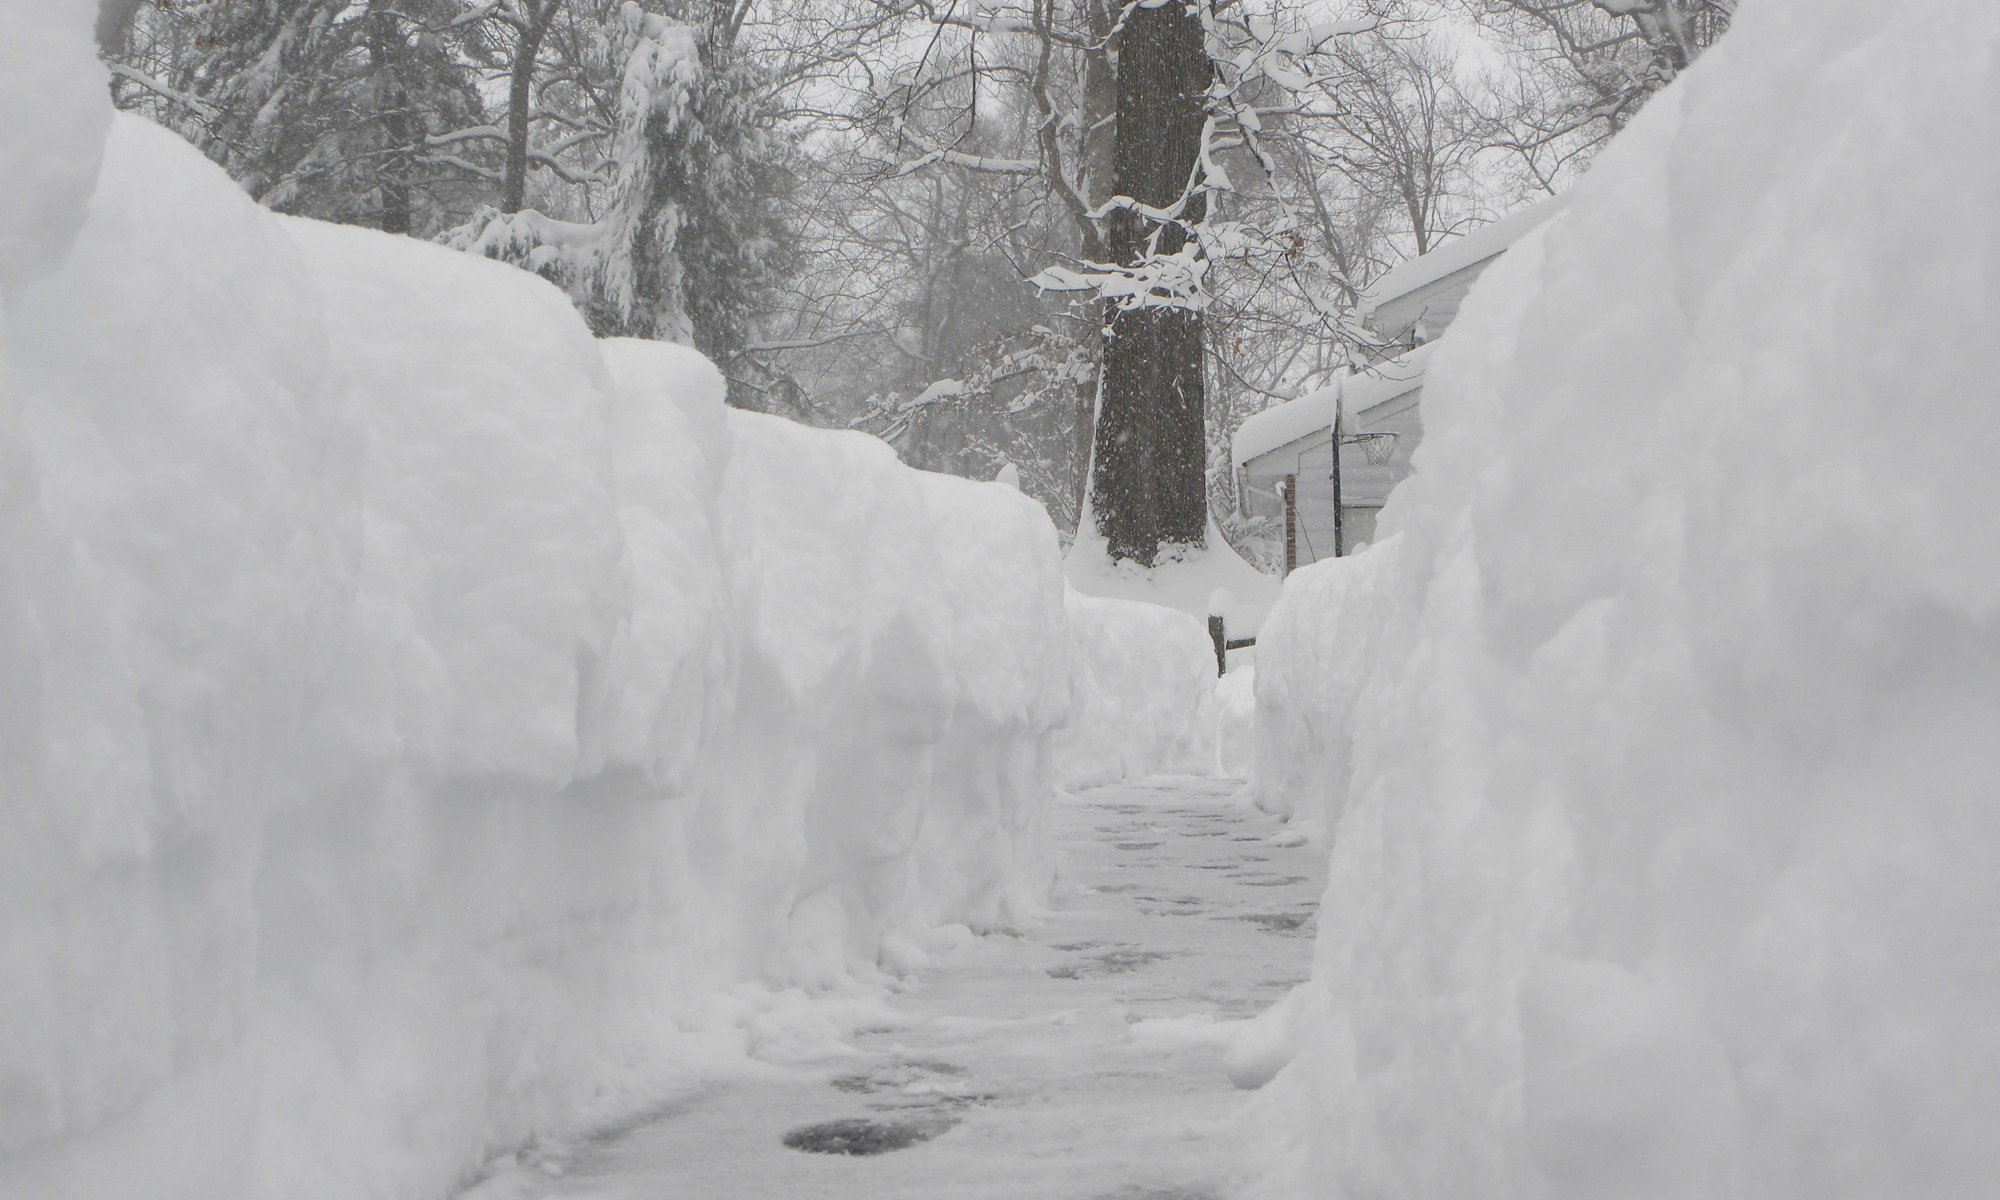 Deep snow shoveled path with footprints